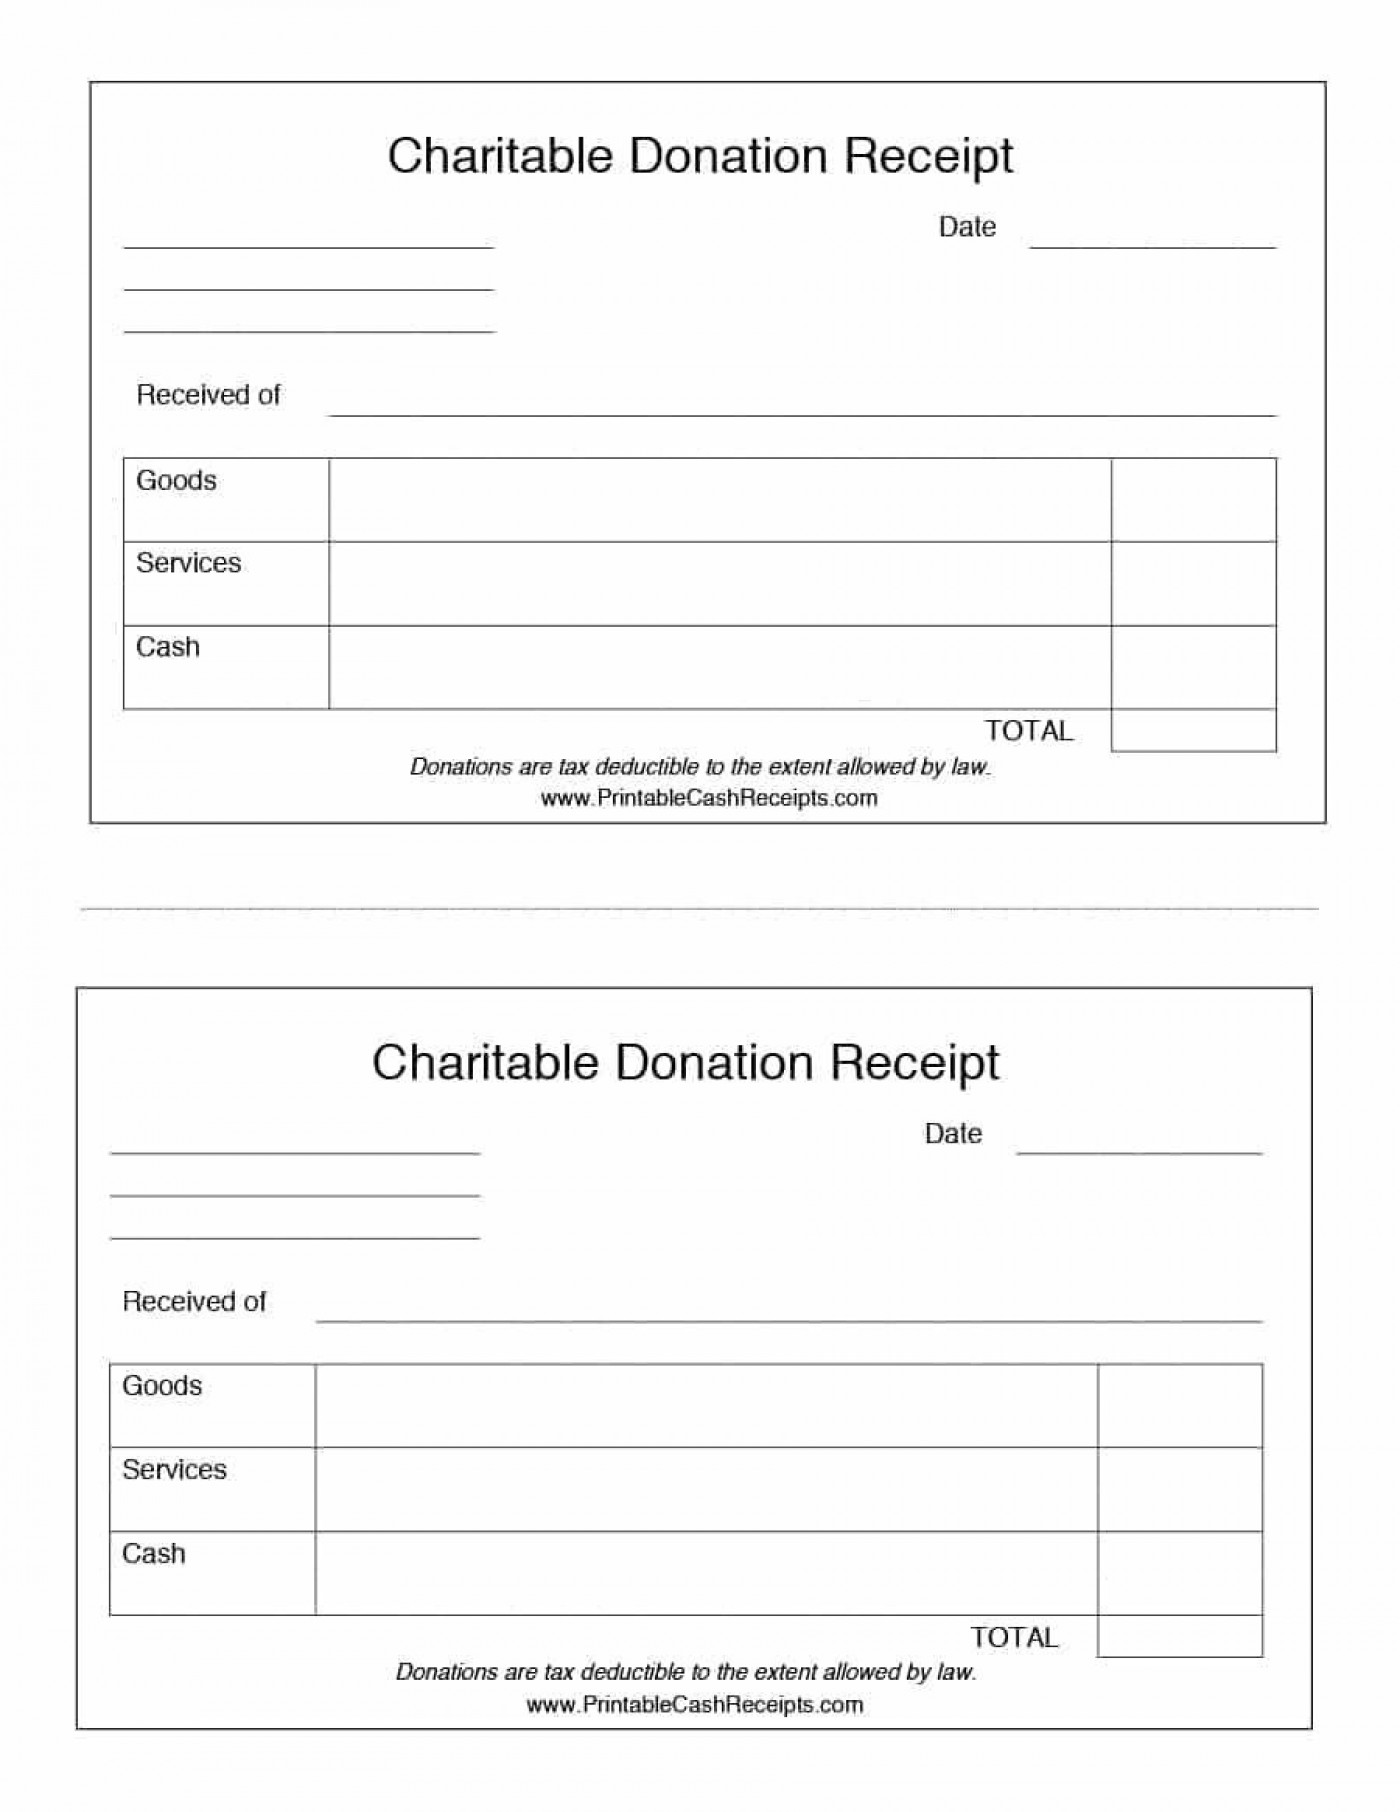 000 Shocking Tax Deductible Donation Receipt Template Australia Sample 1400